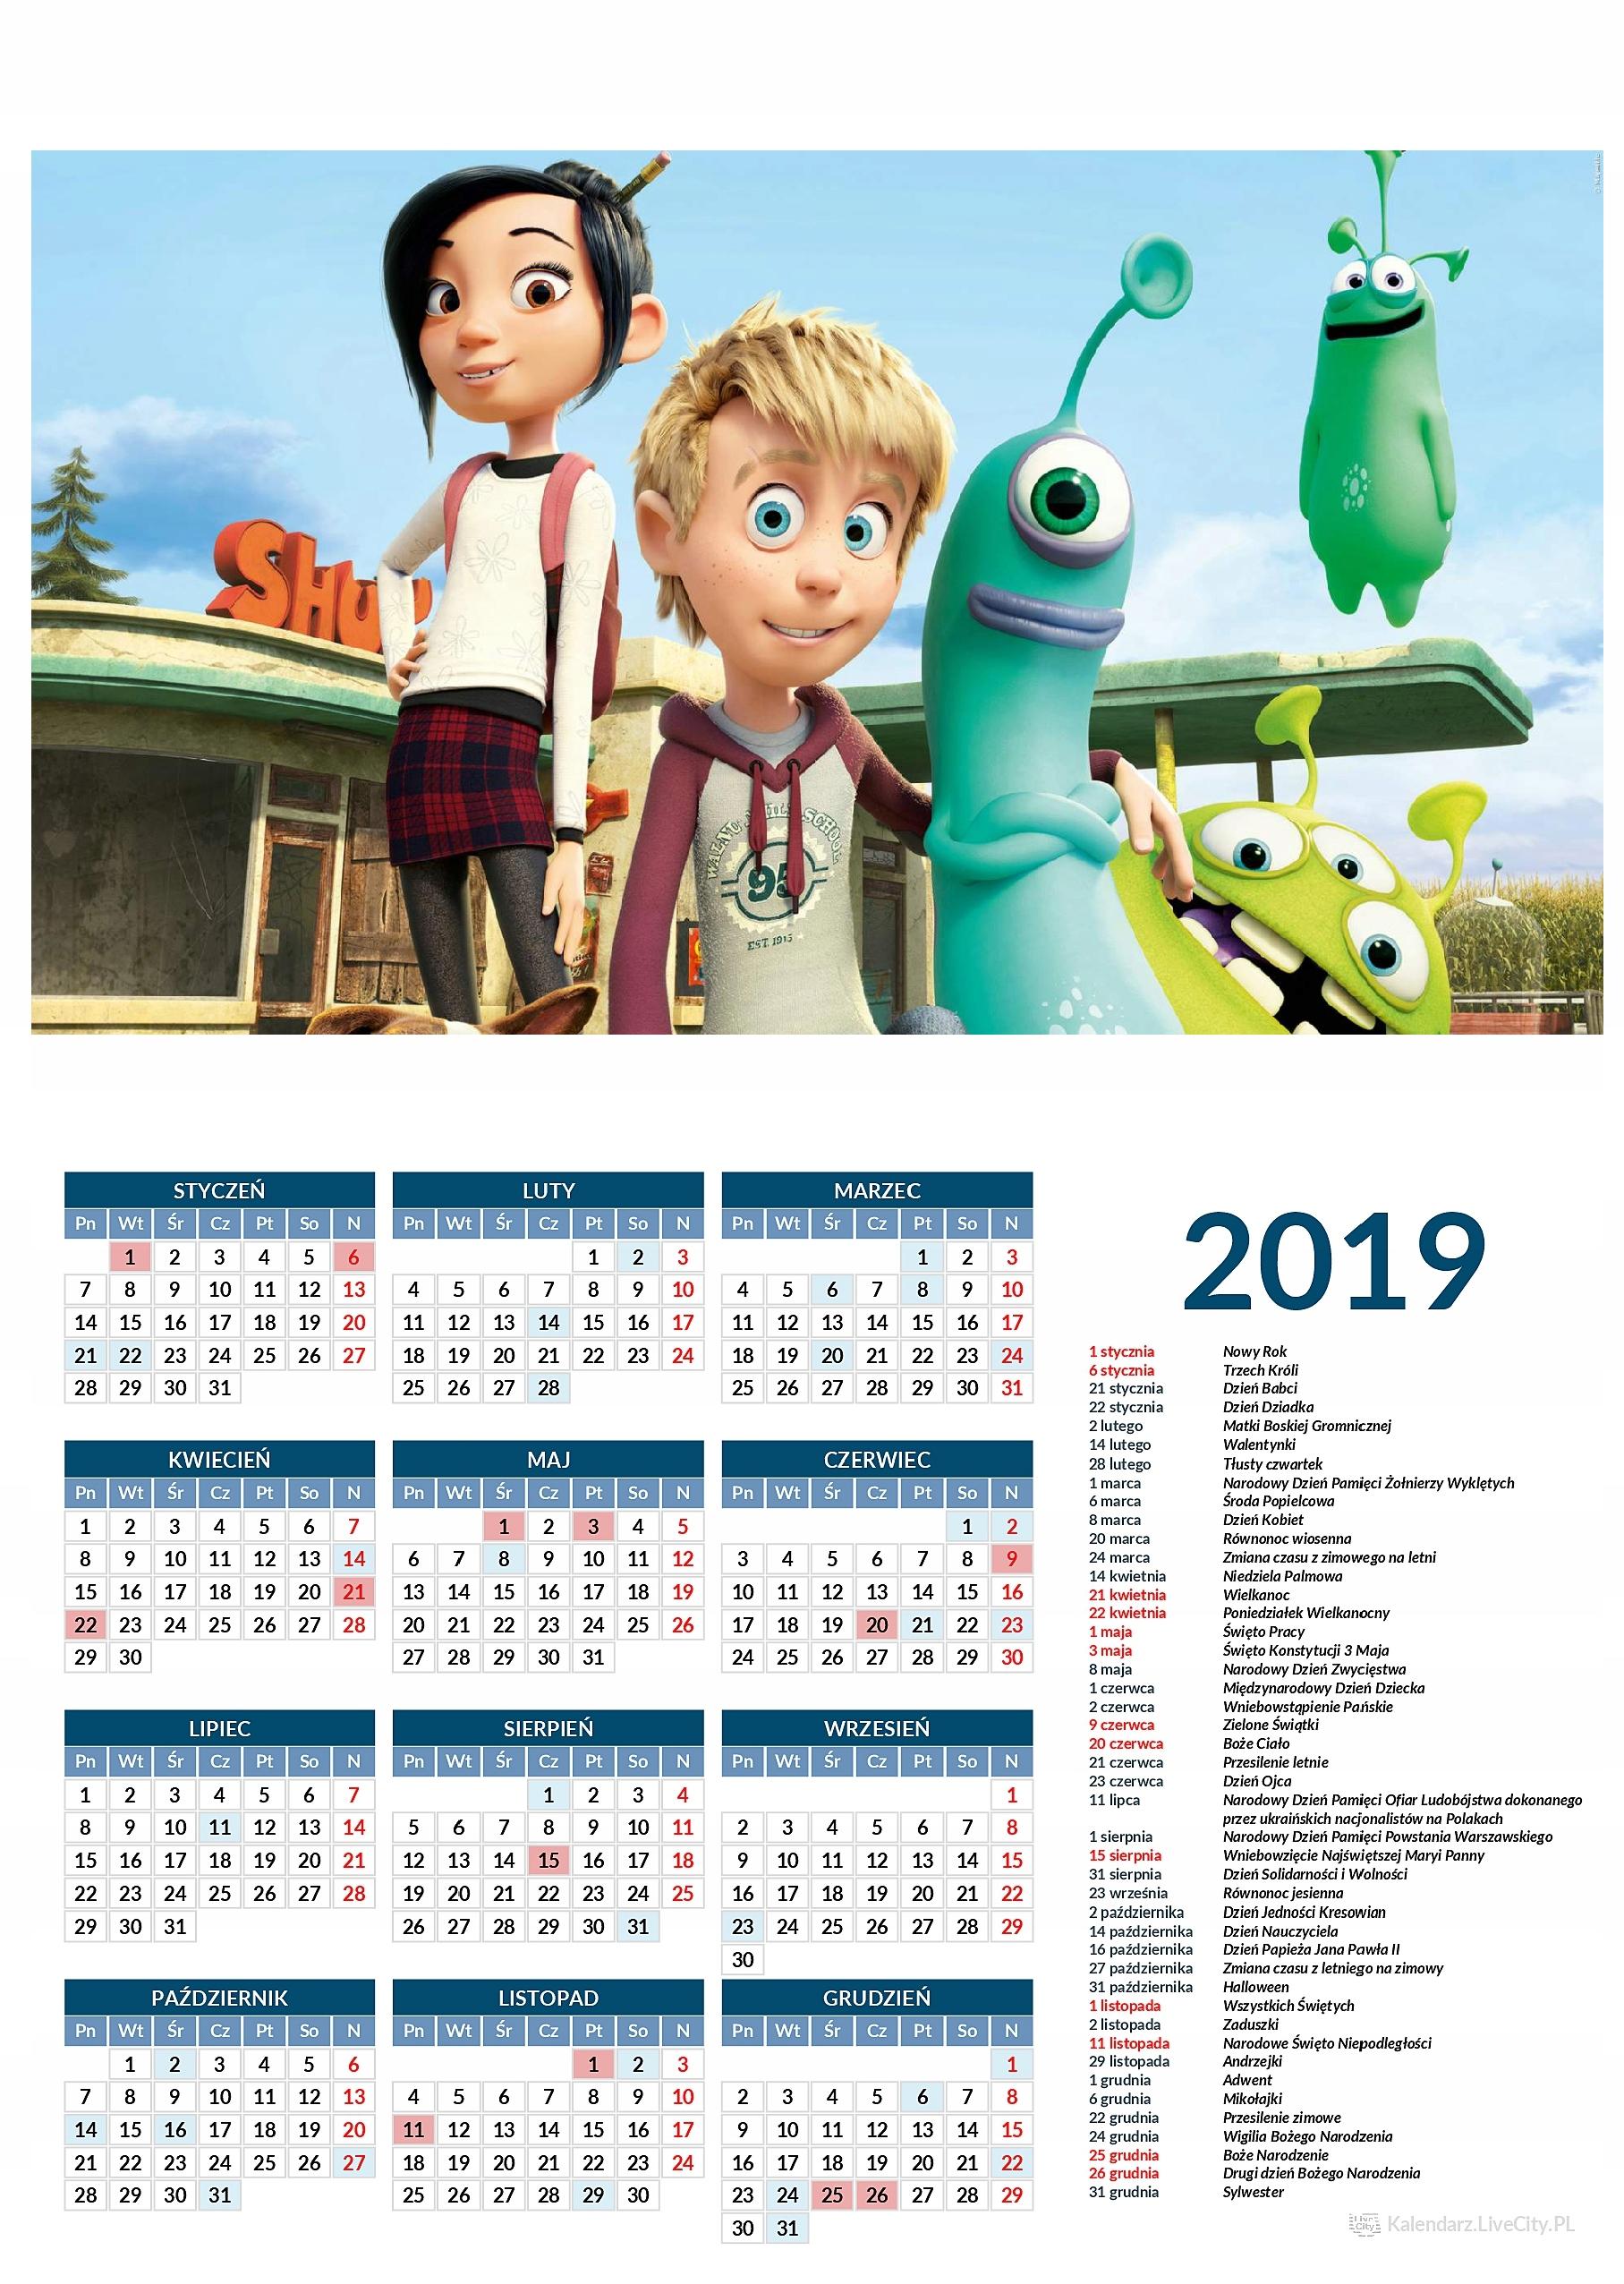 Kalendarz 2019 film luis i obcy